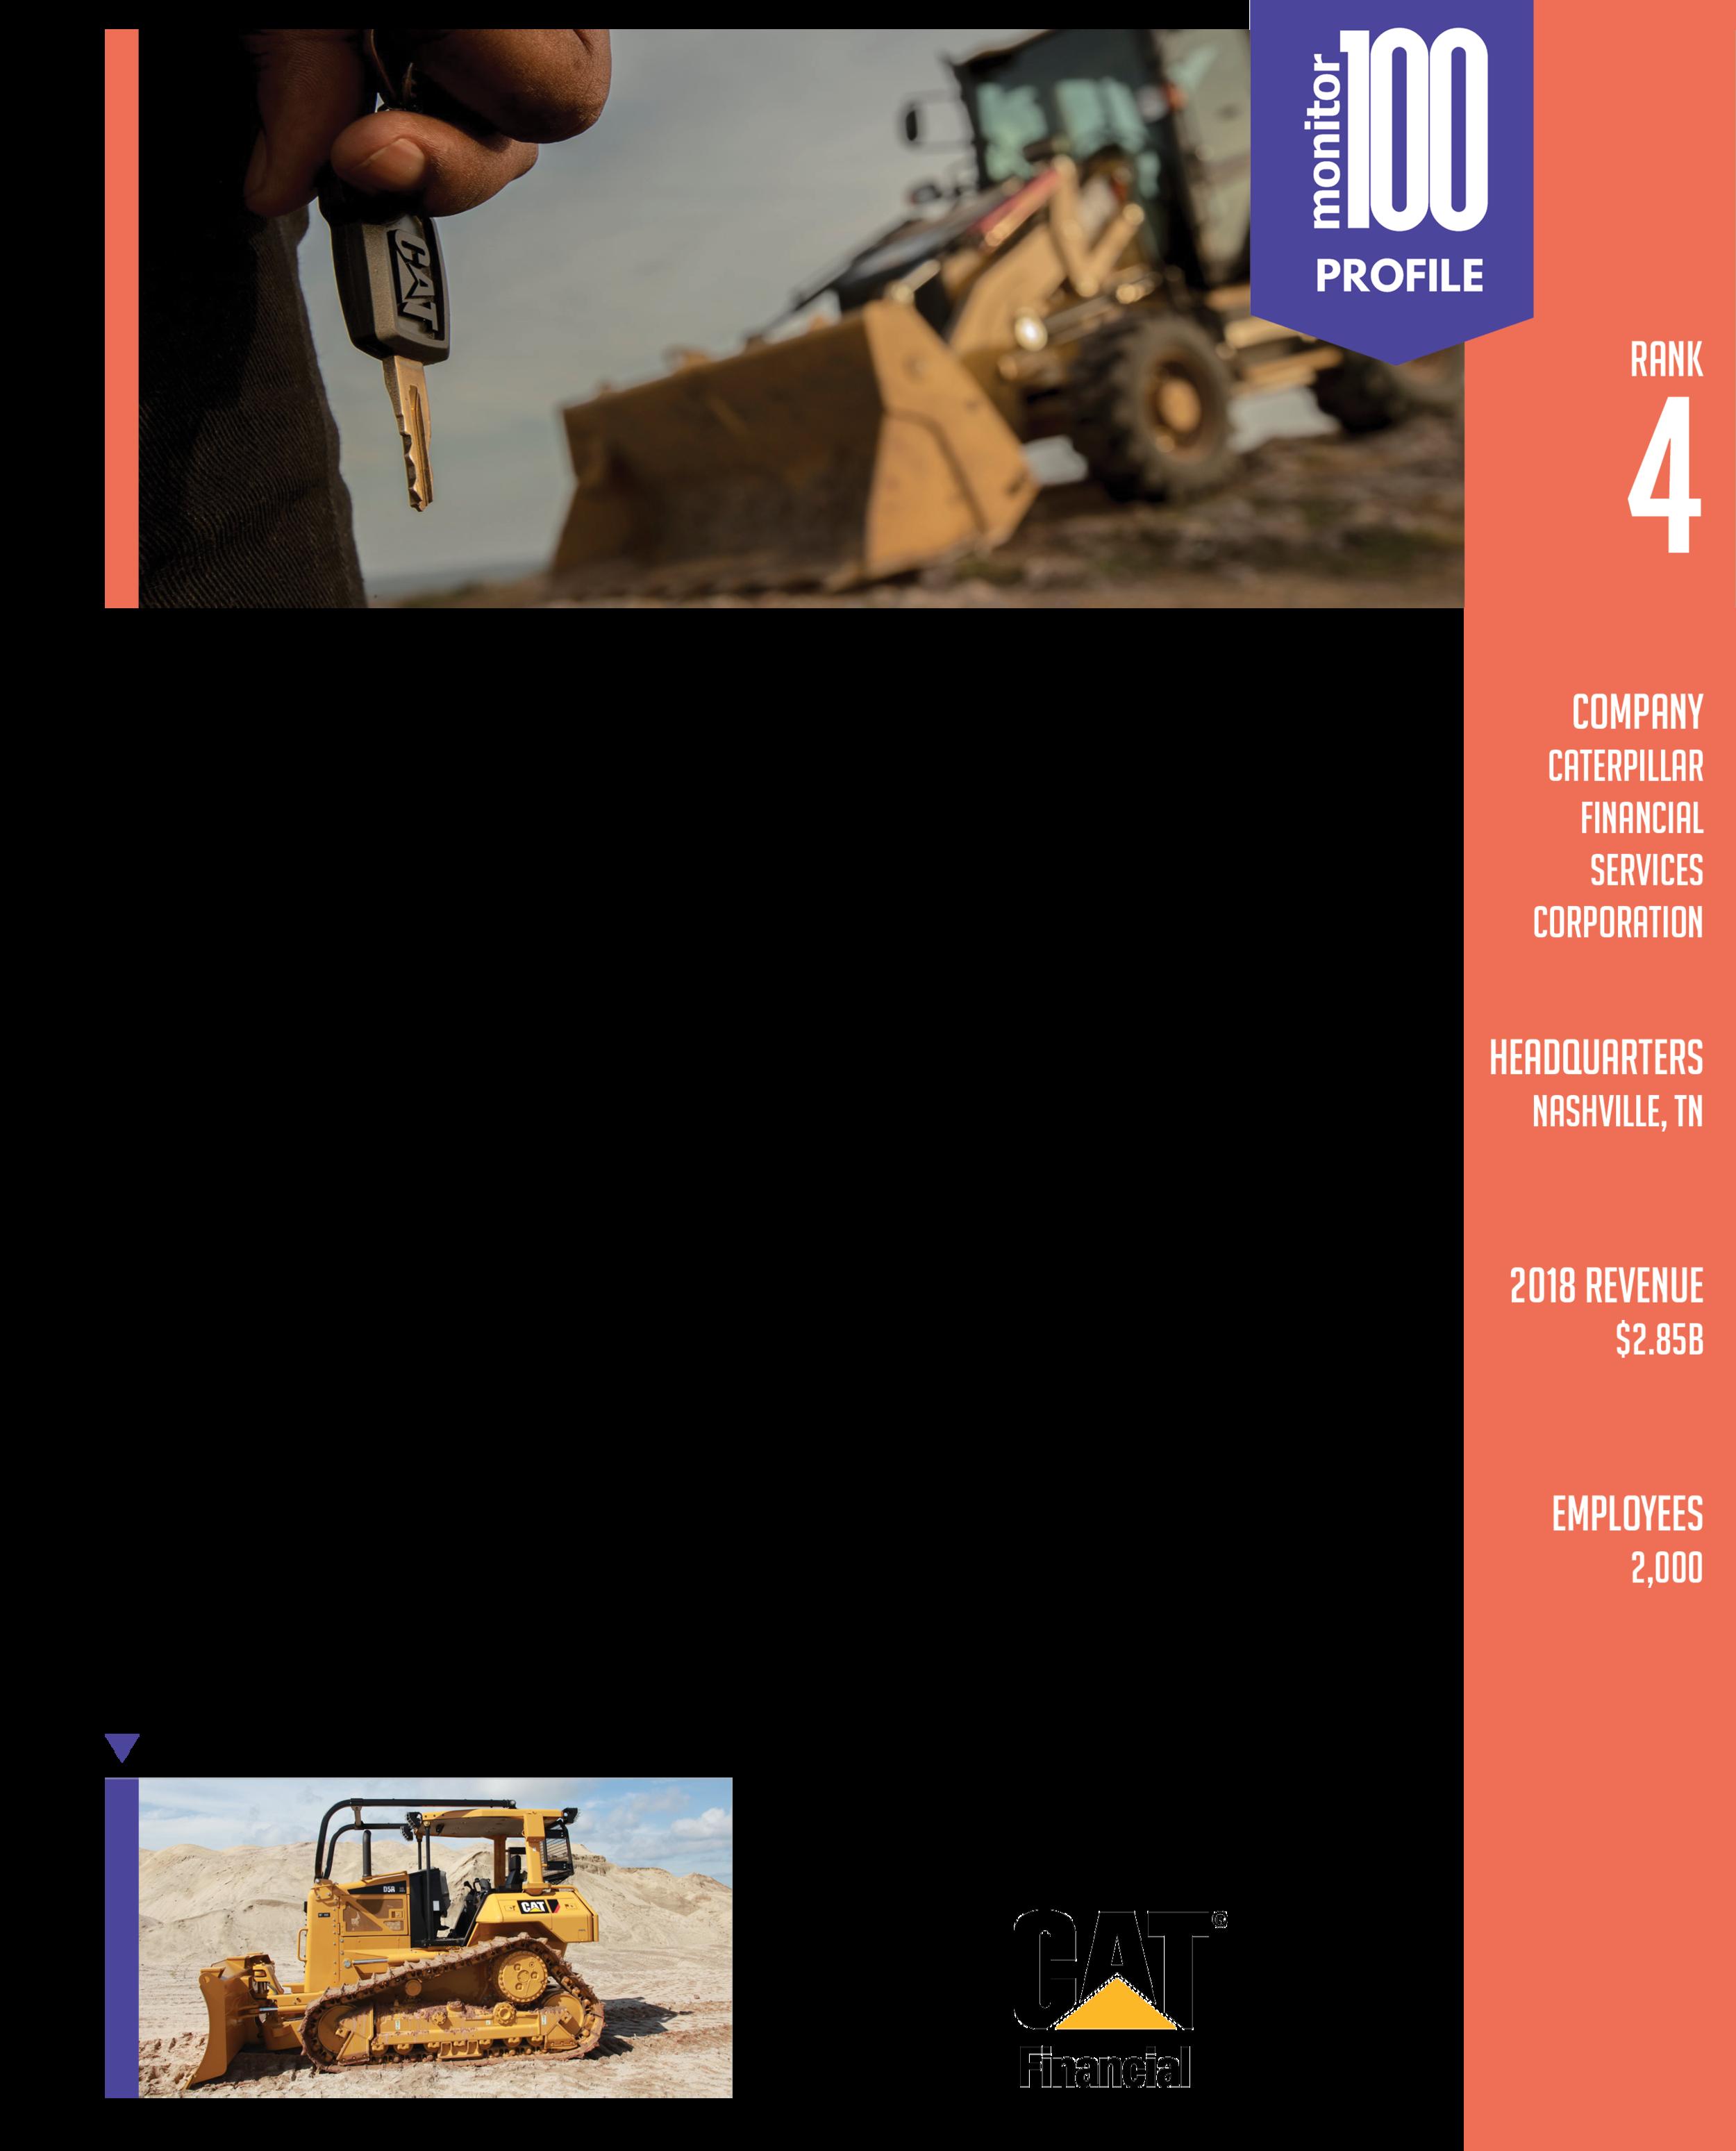 cat-equipment-finance monitor 100 profile